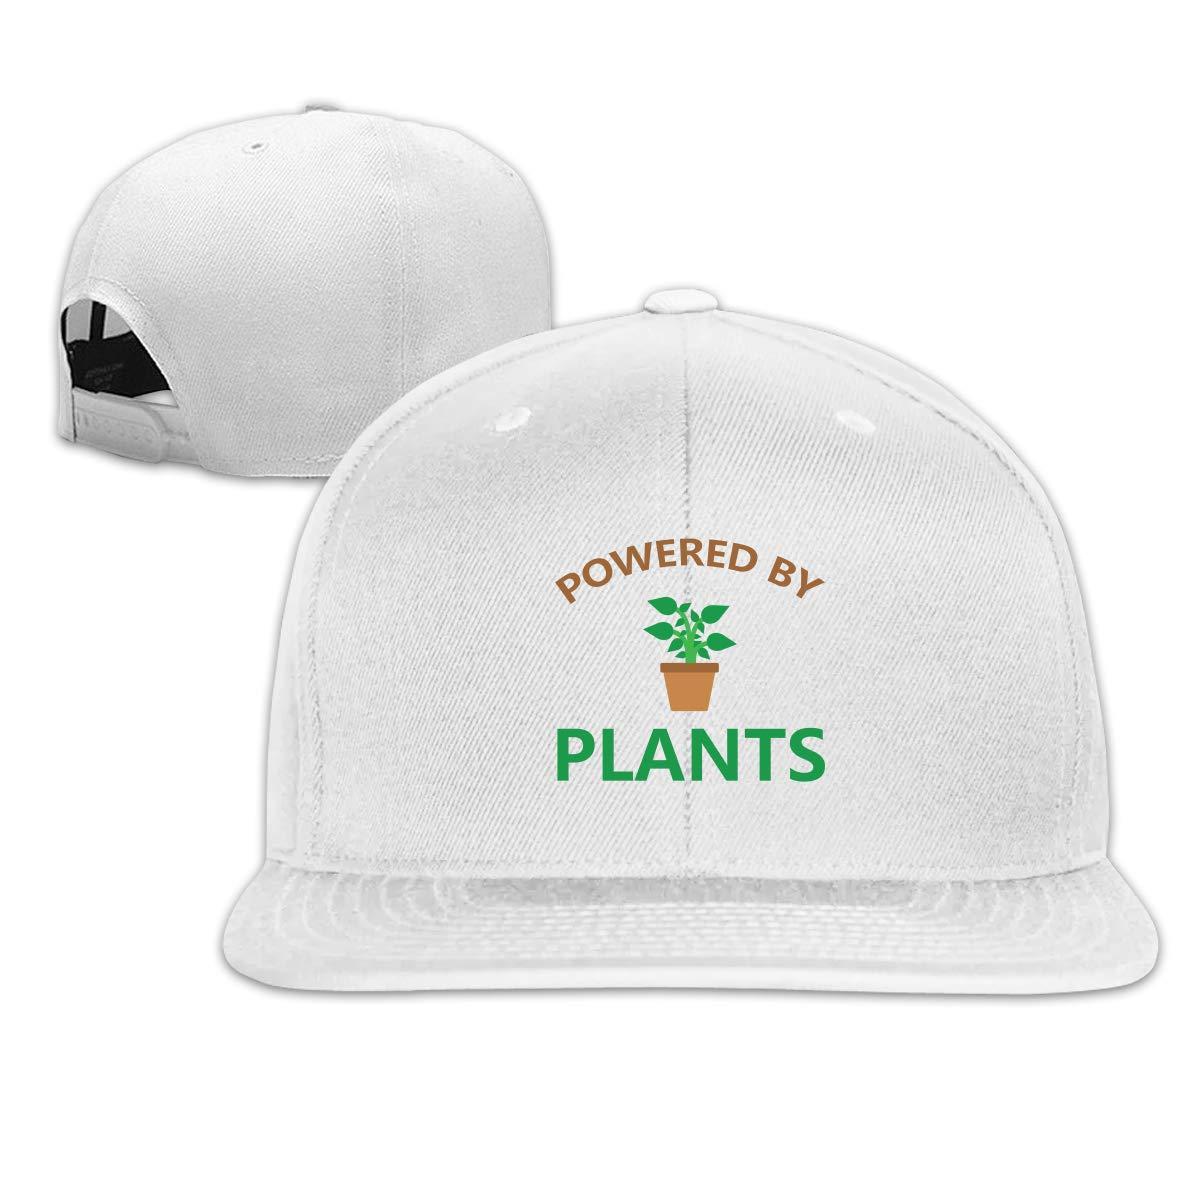 MOCSTONE Unisex Snapback Hat Powered by Plants Adjustable Baseball Cap